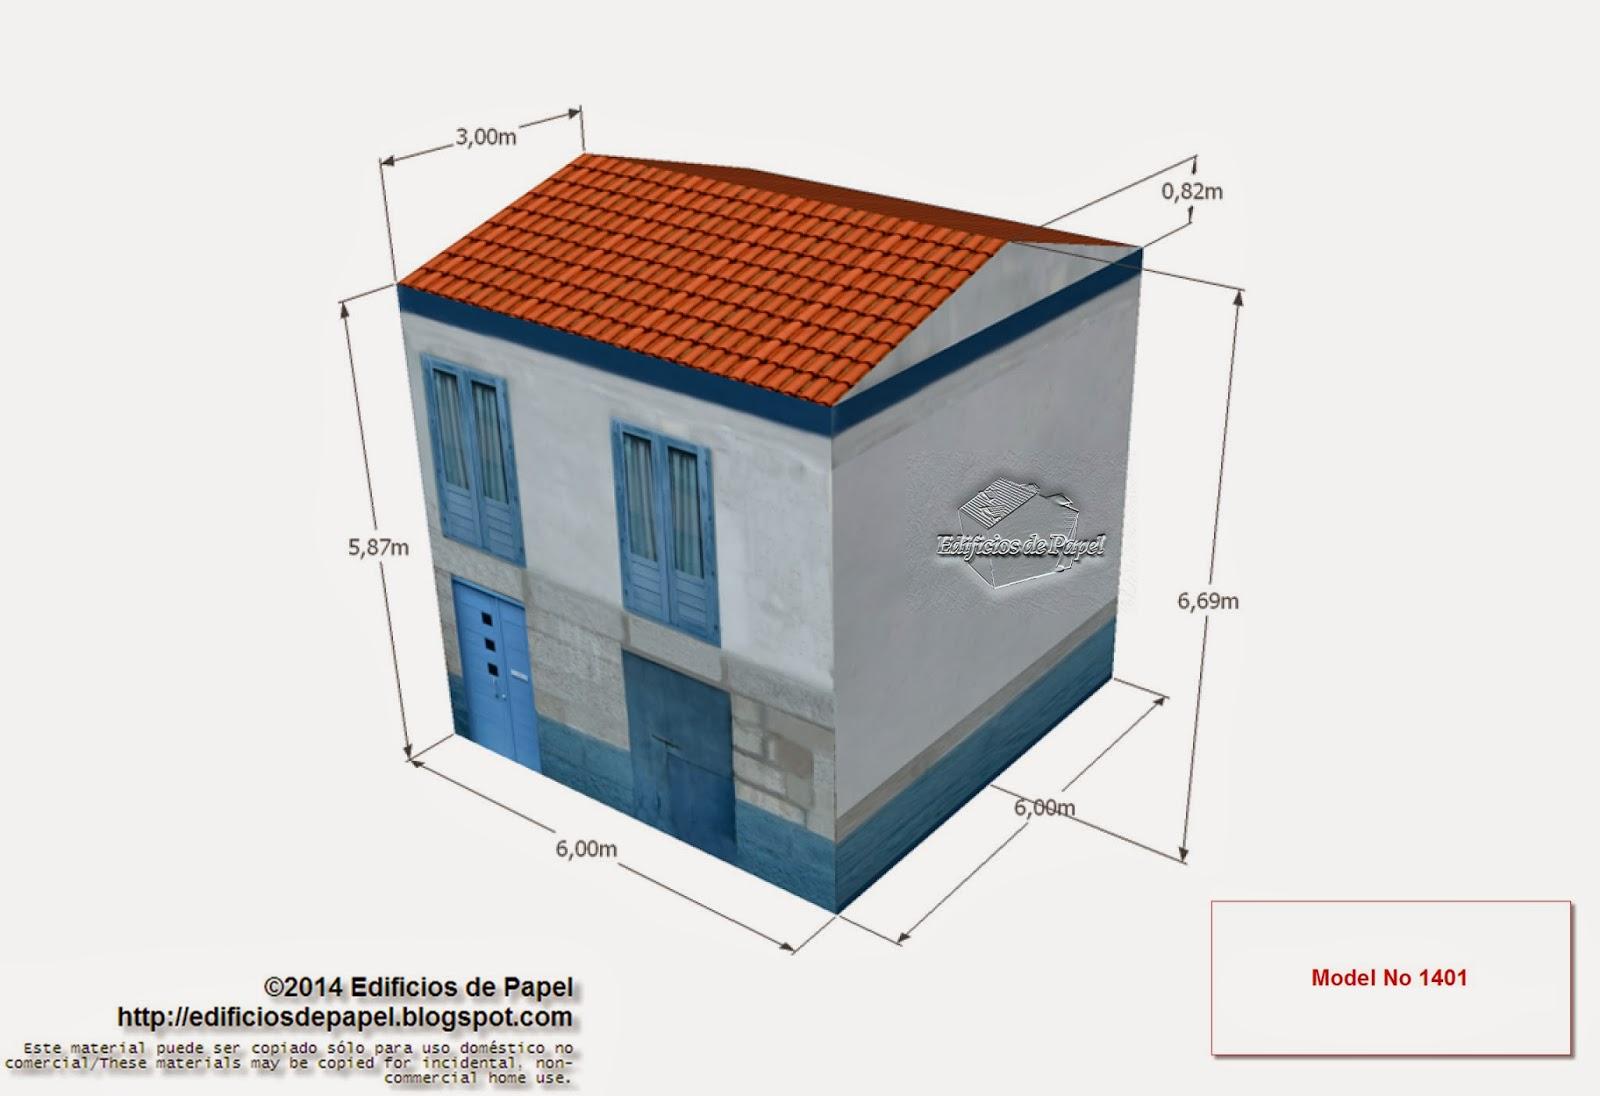 """Edificios de Papel"" - Casa Marítima Azul - Model No: 1401"